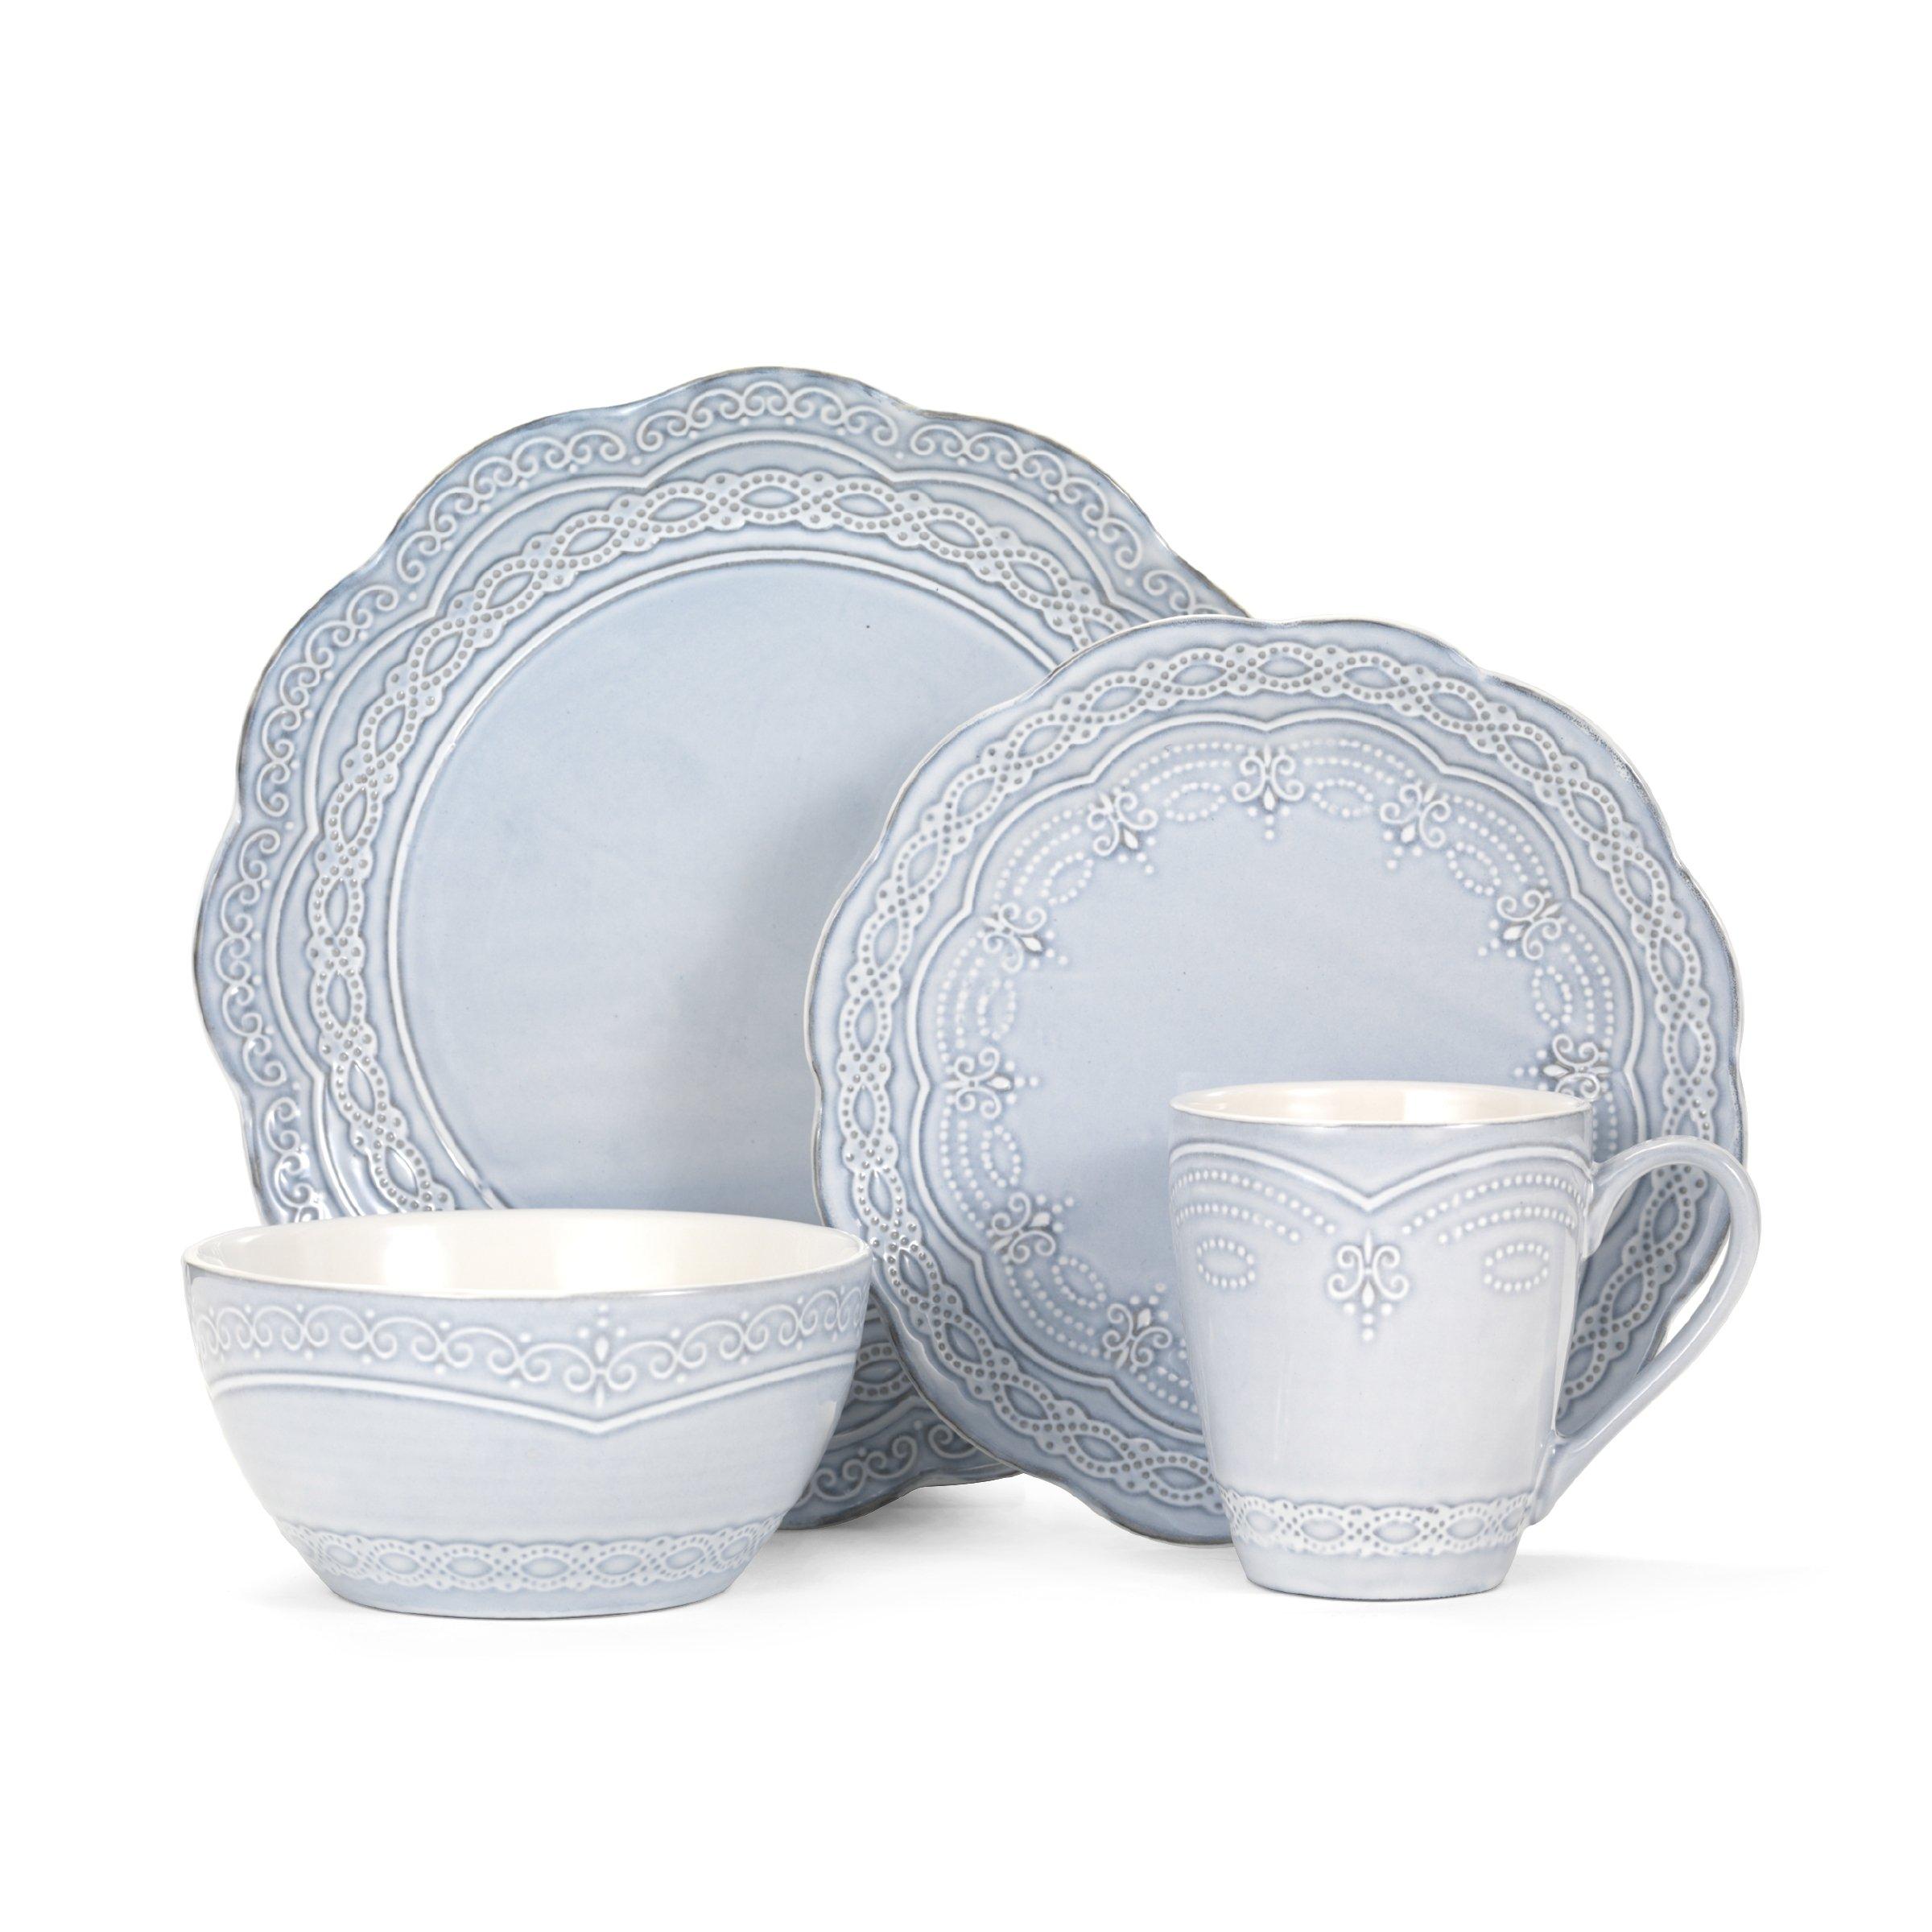 Pfaltzgraff Seraphina 16-Piece Stoneware Dinnerware Set, Service for 4